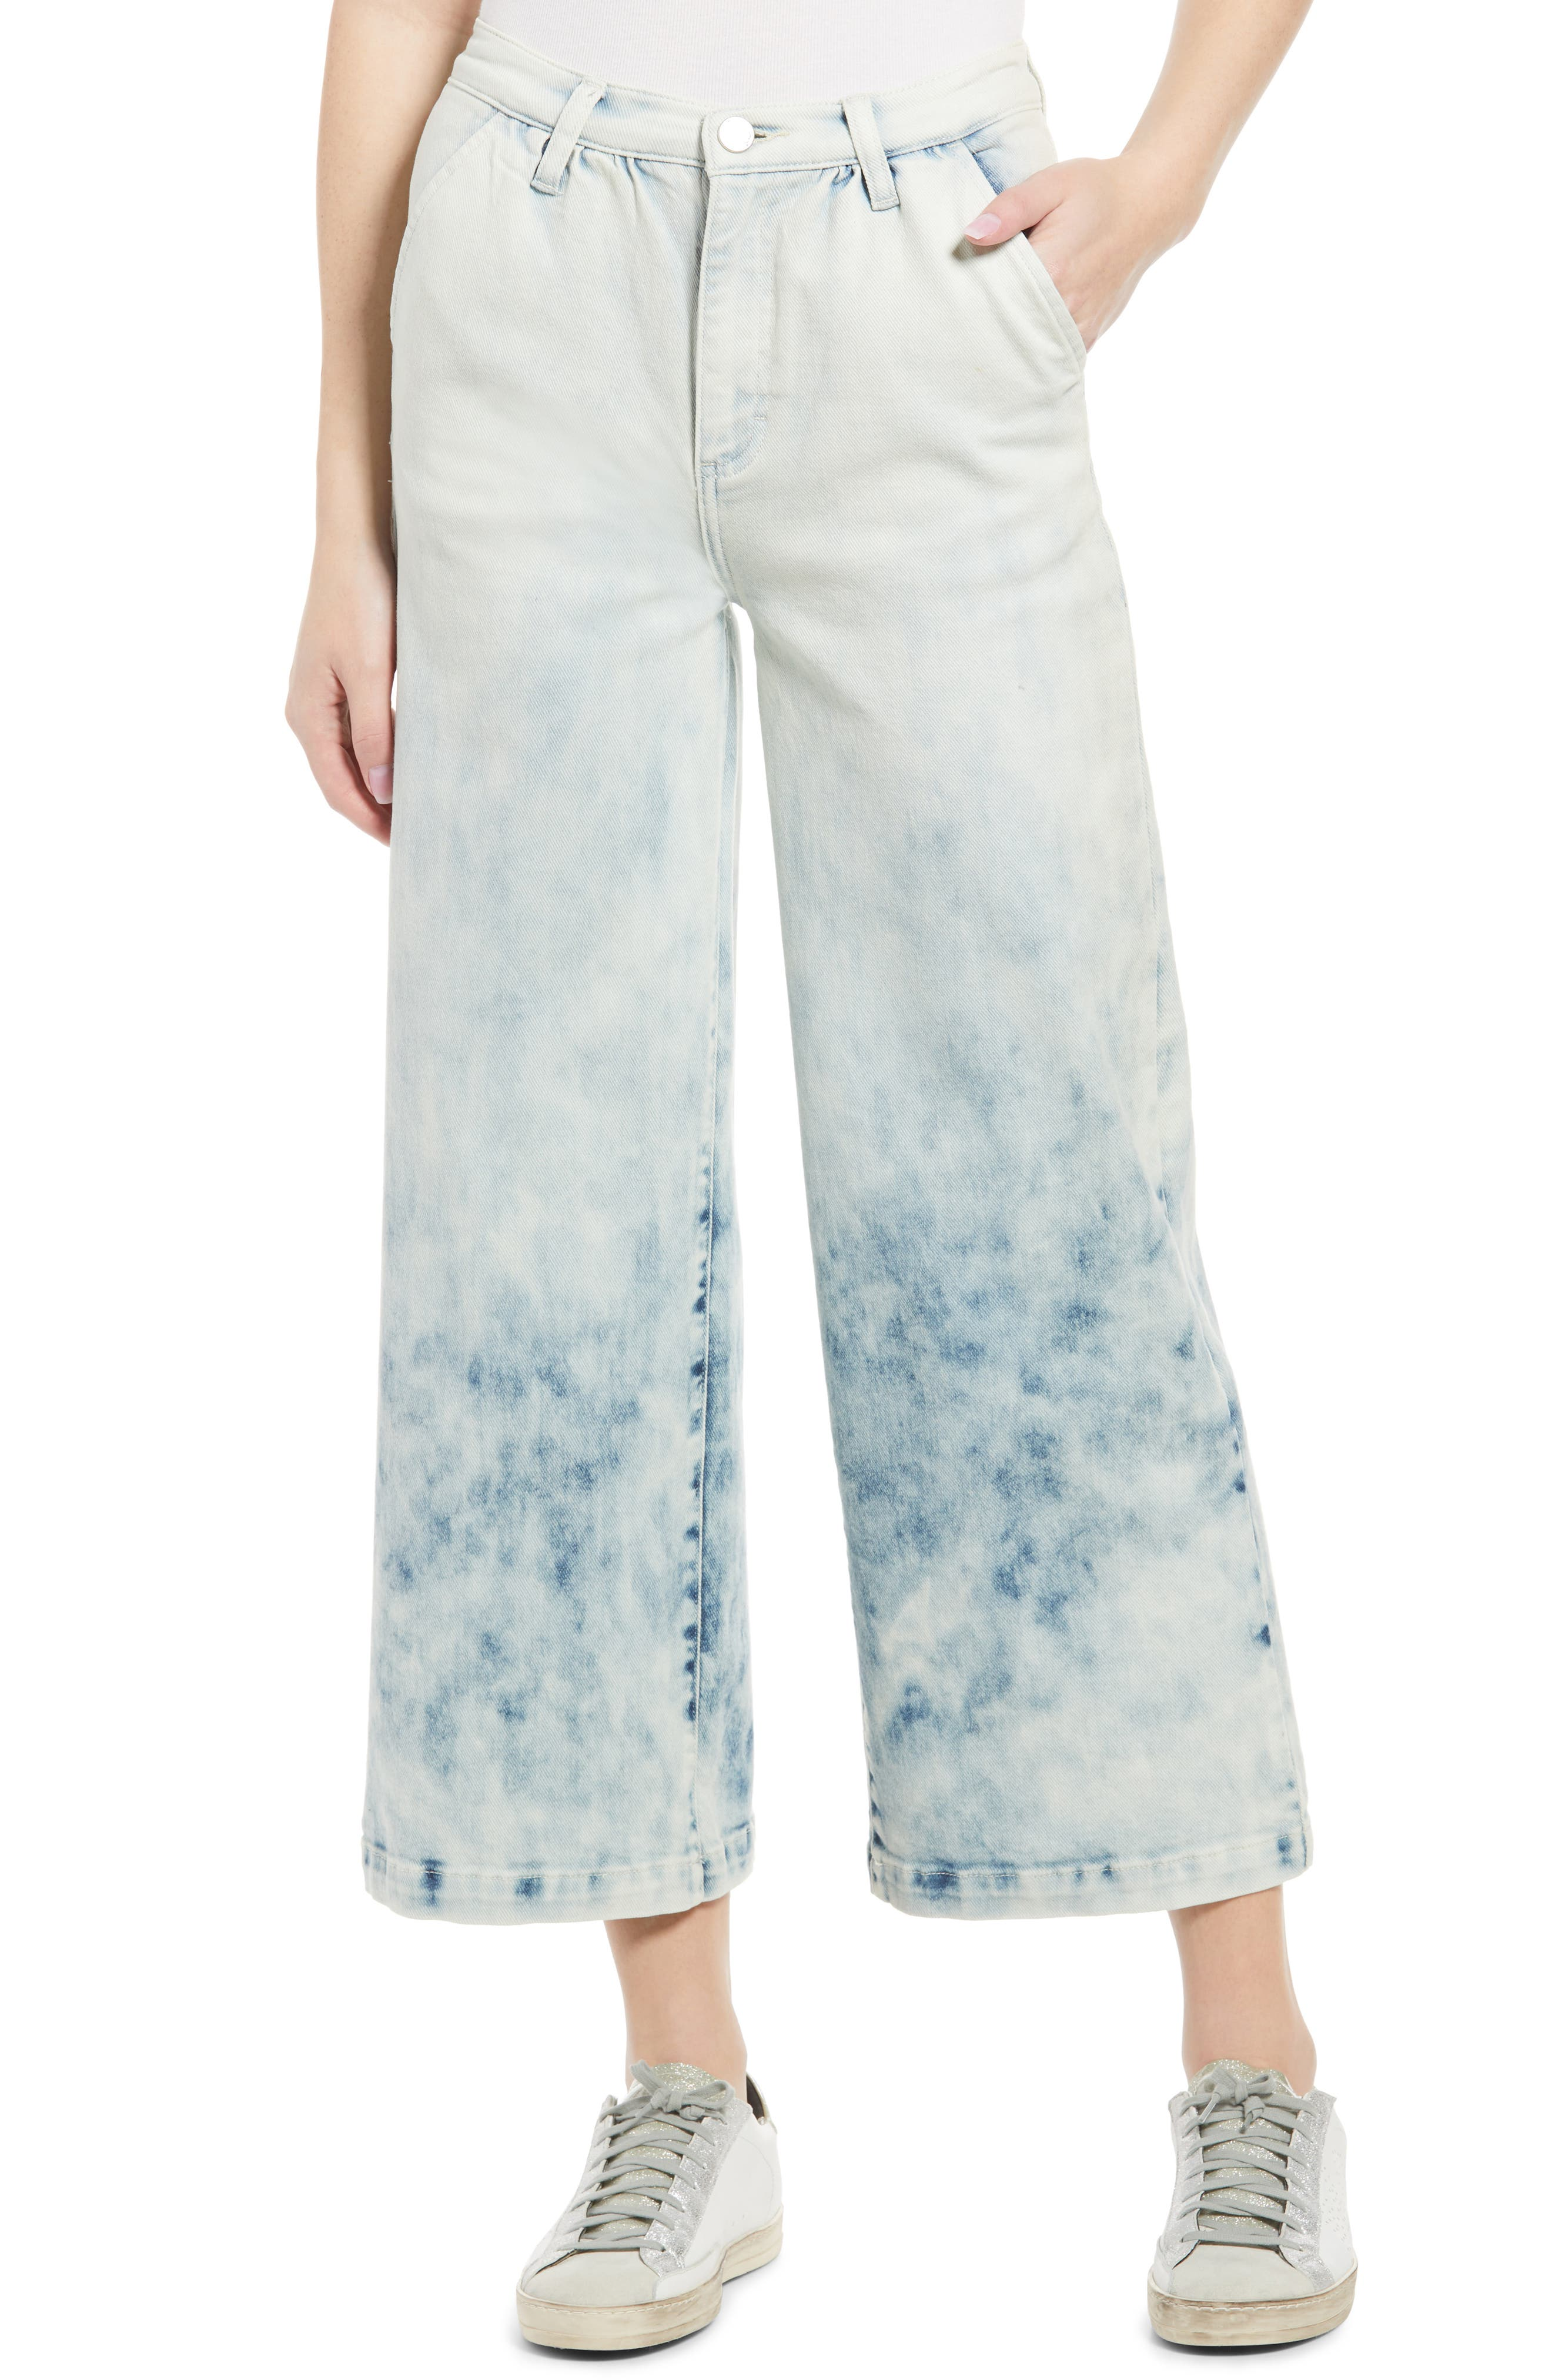 Gradient High Waist Crop Wide Leg Jeans